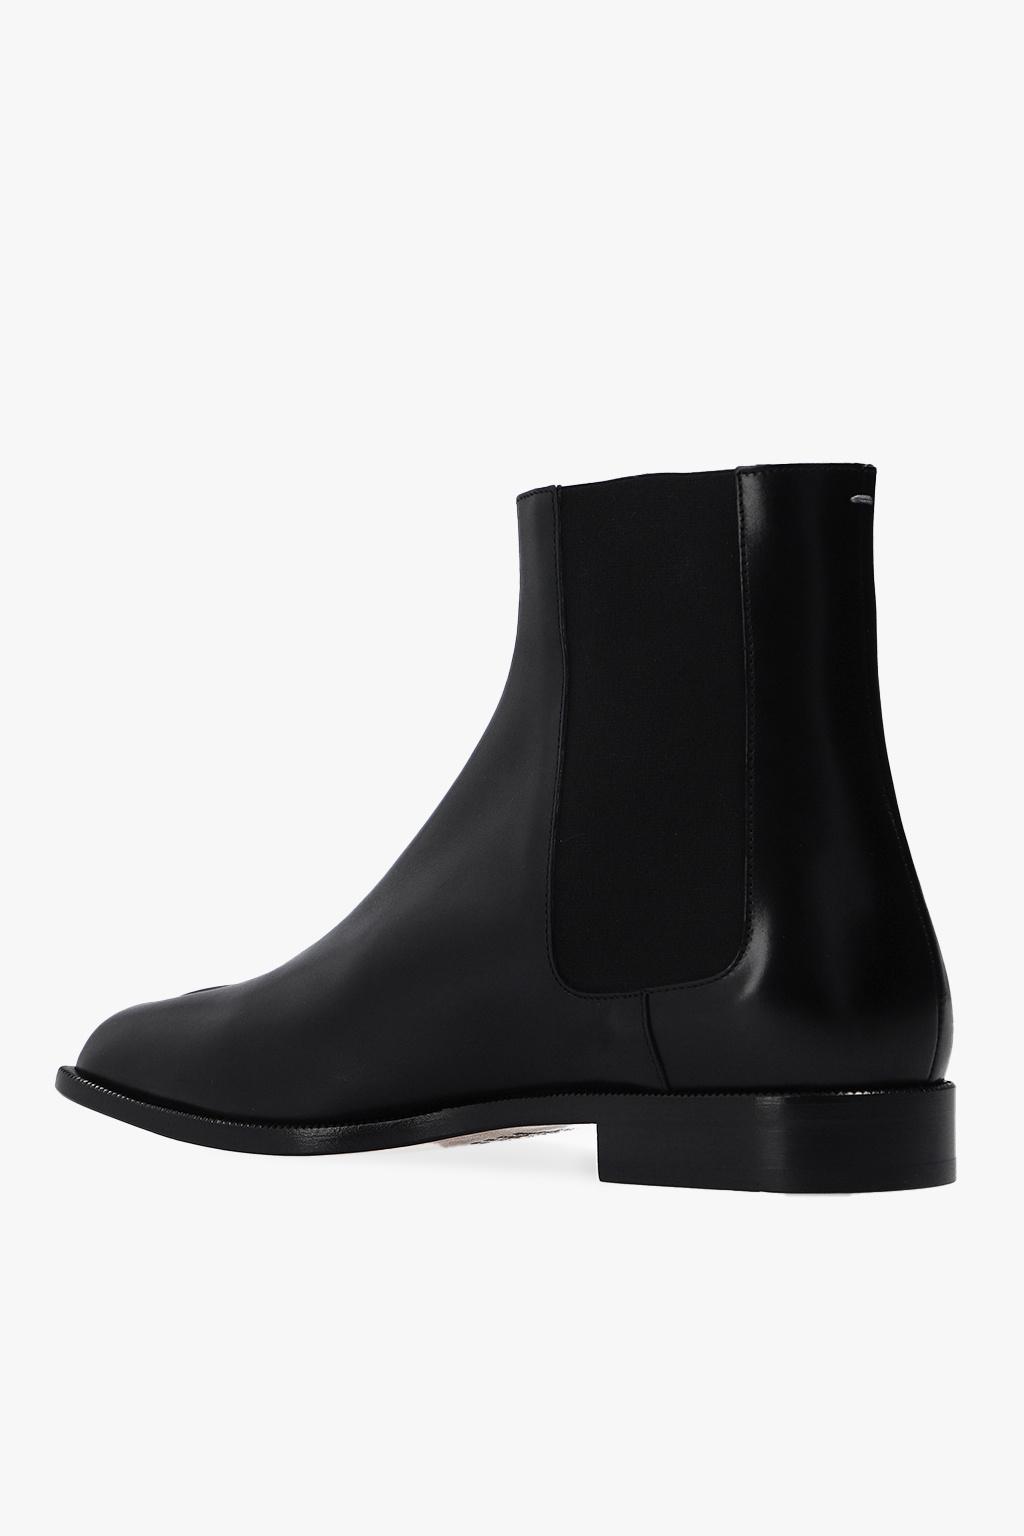 Maison Margiela 'Tabi' split-toe ankle boots